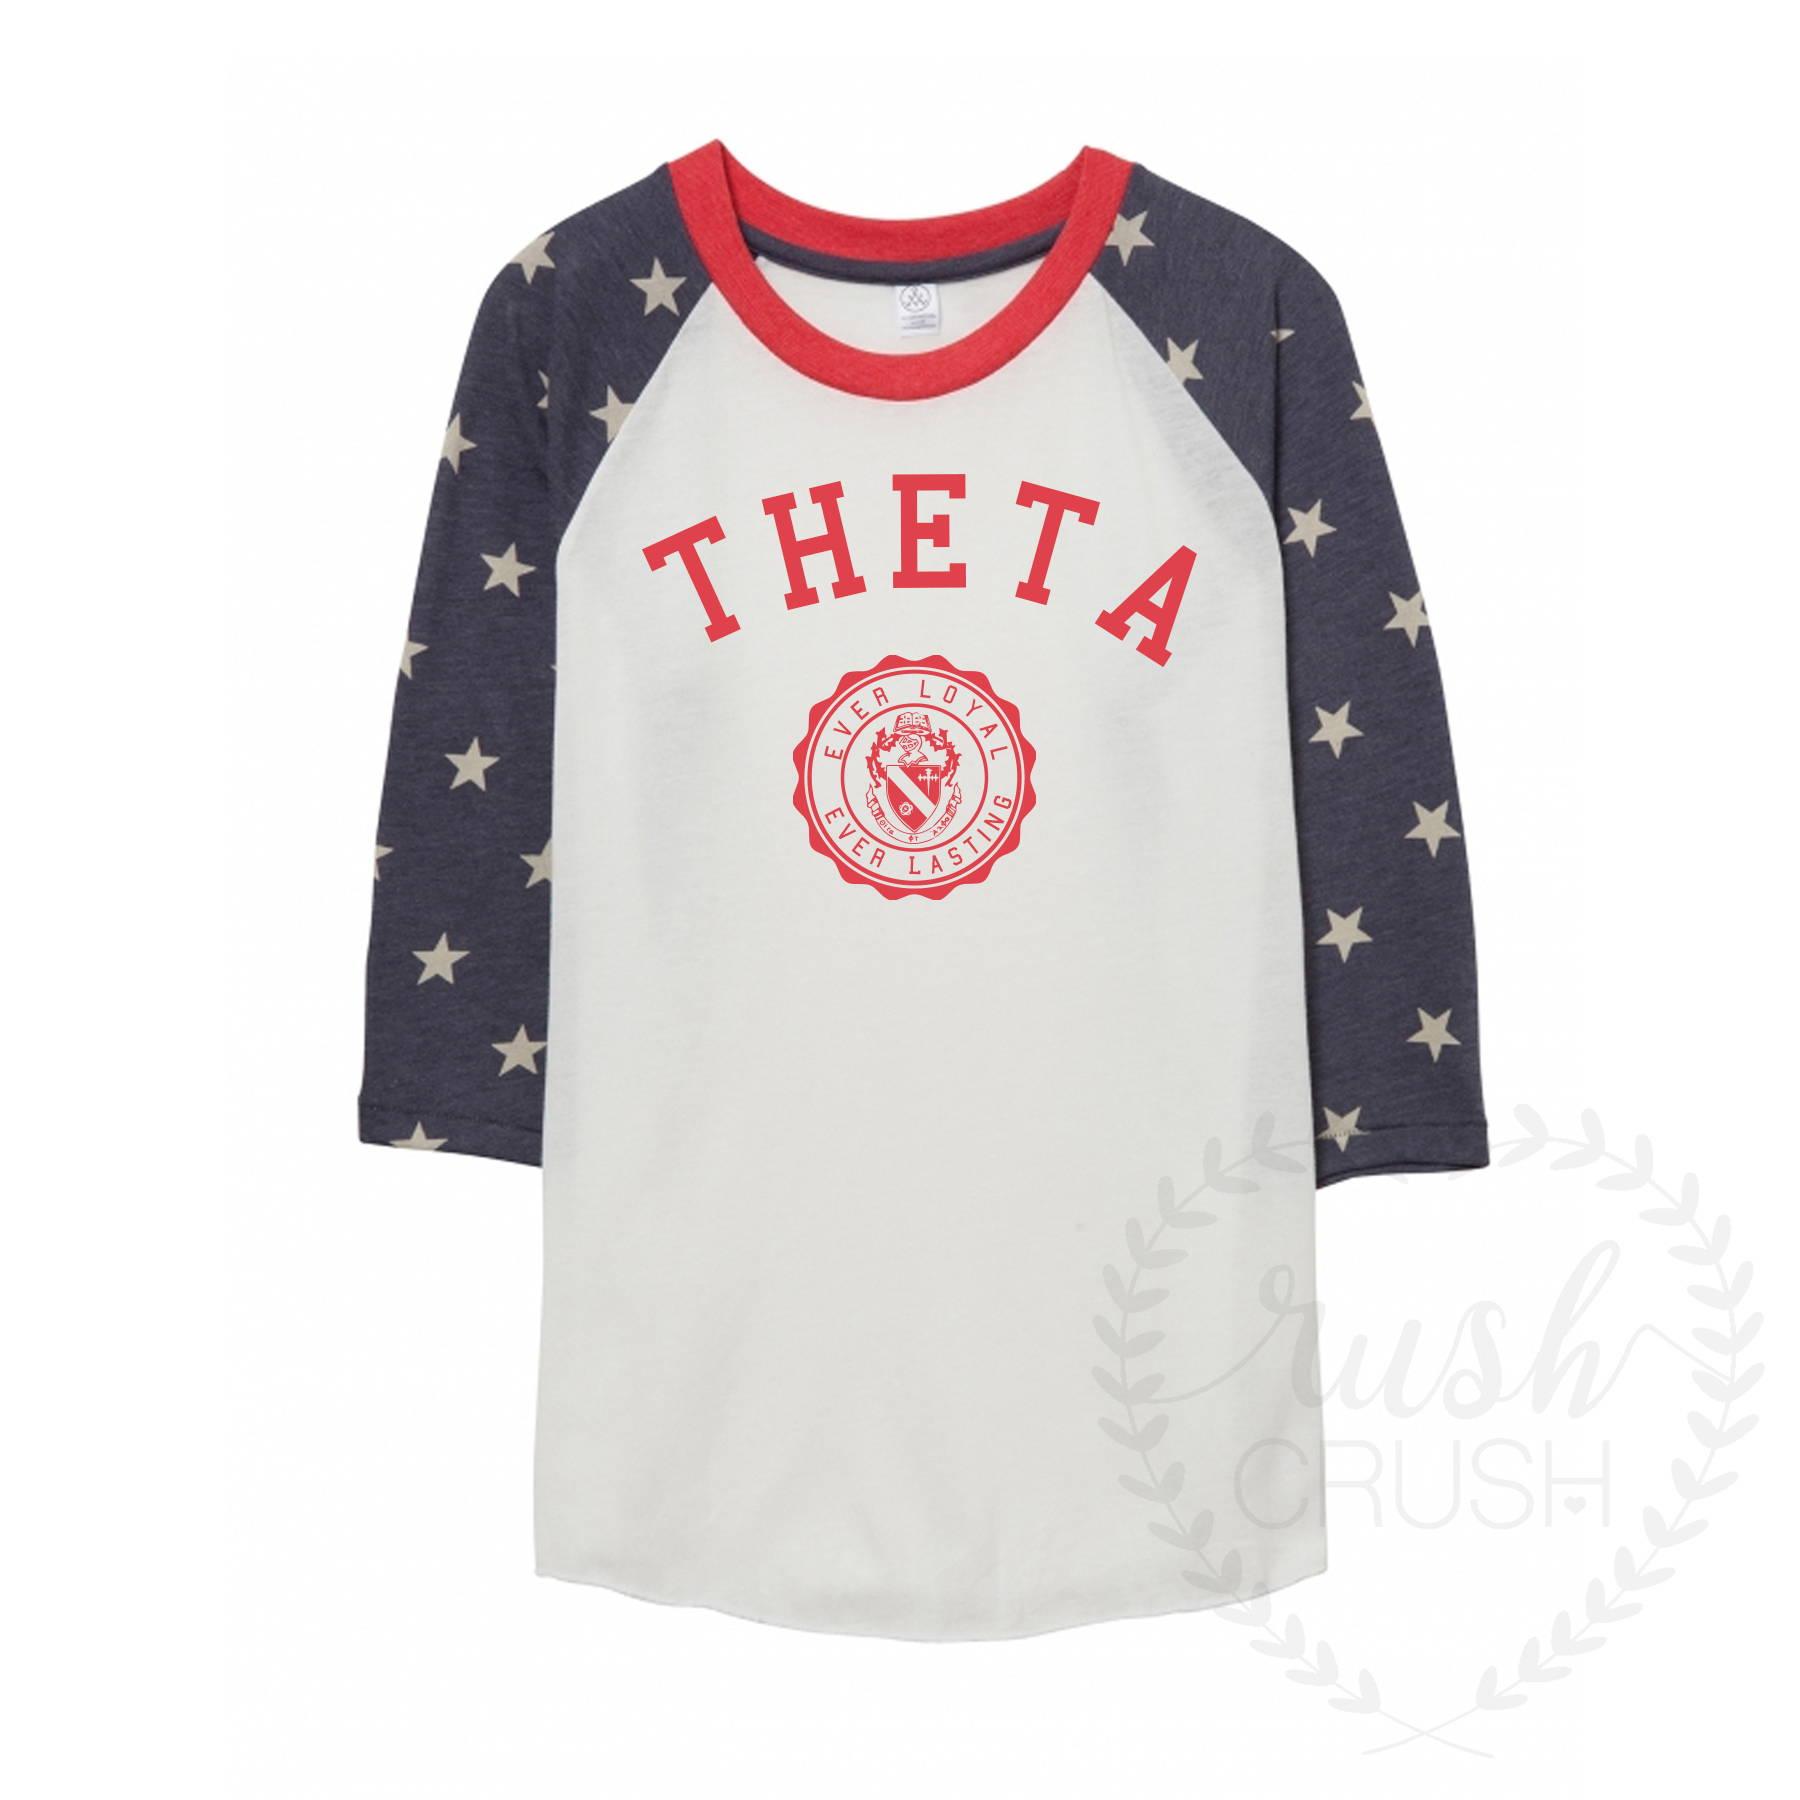 Theta Phi Alpha Crest Shirt